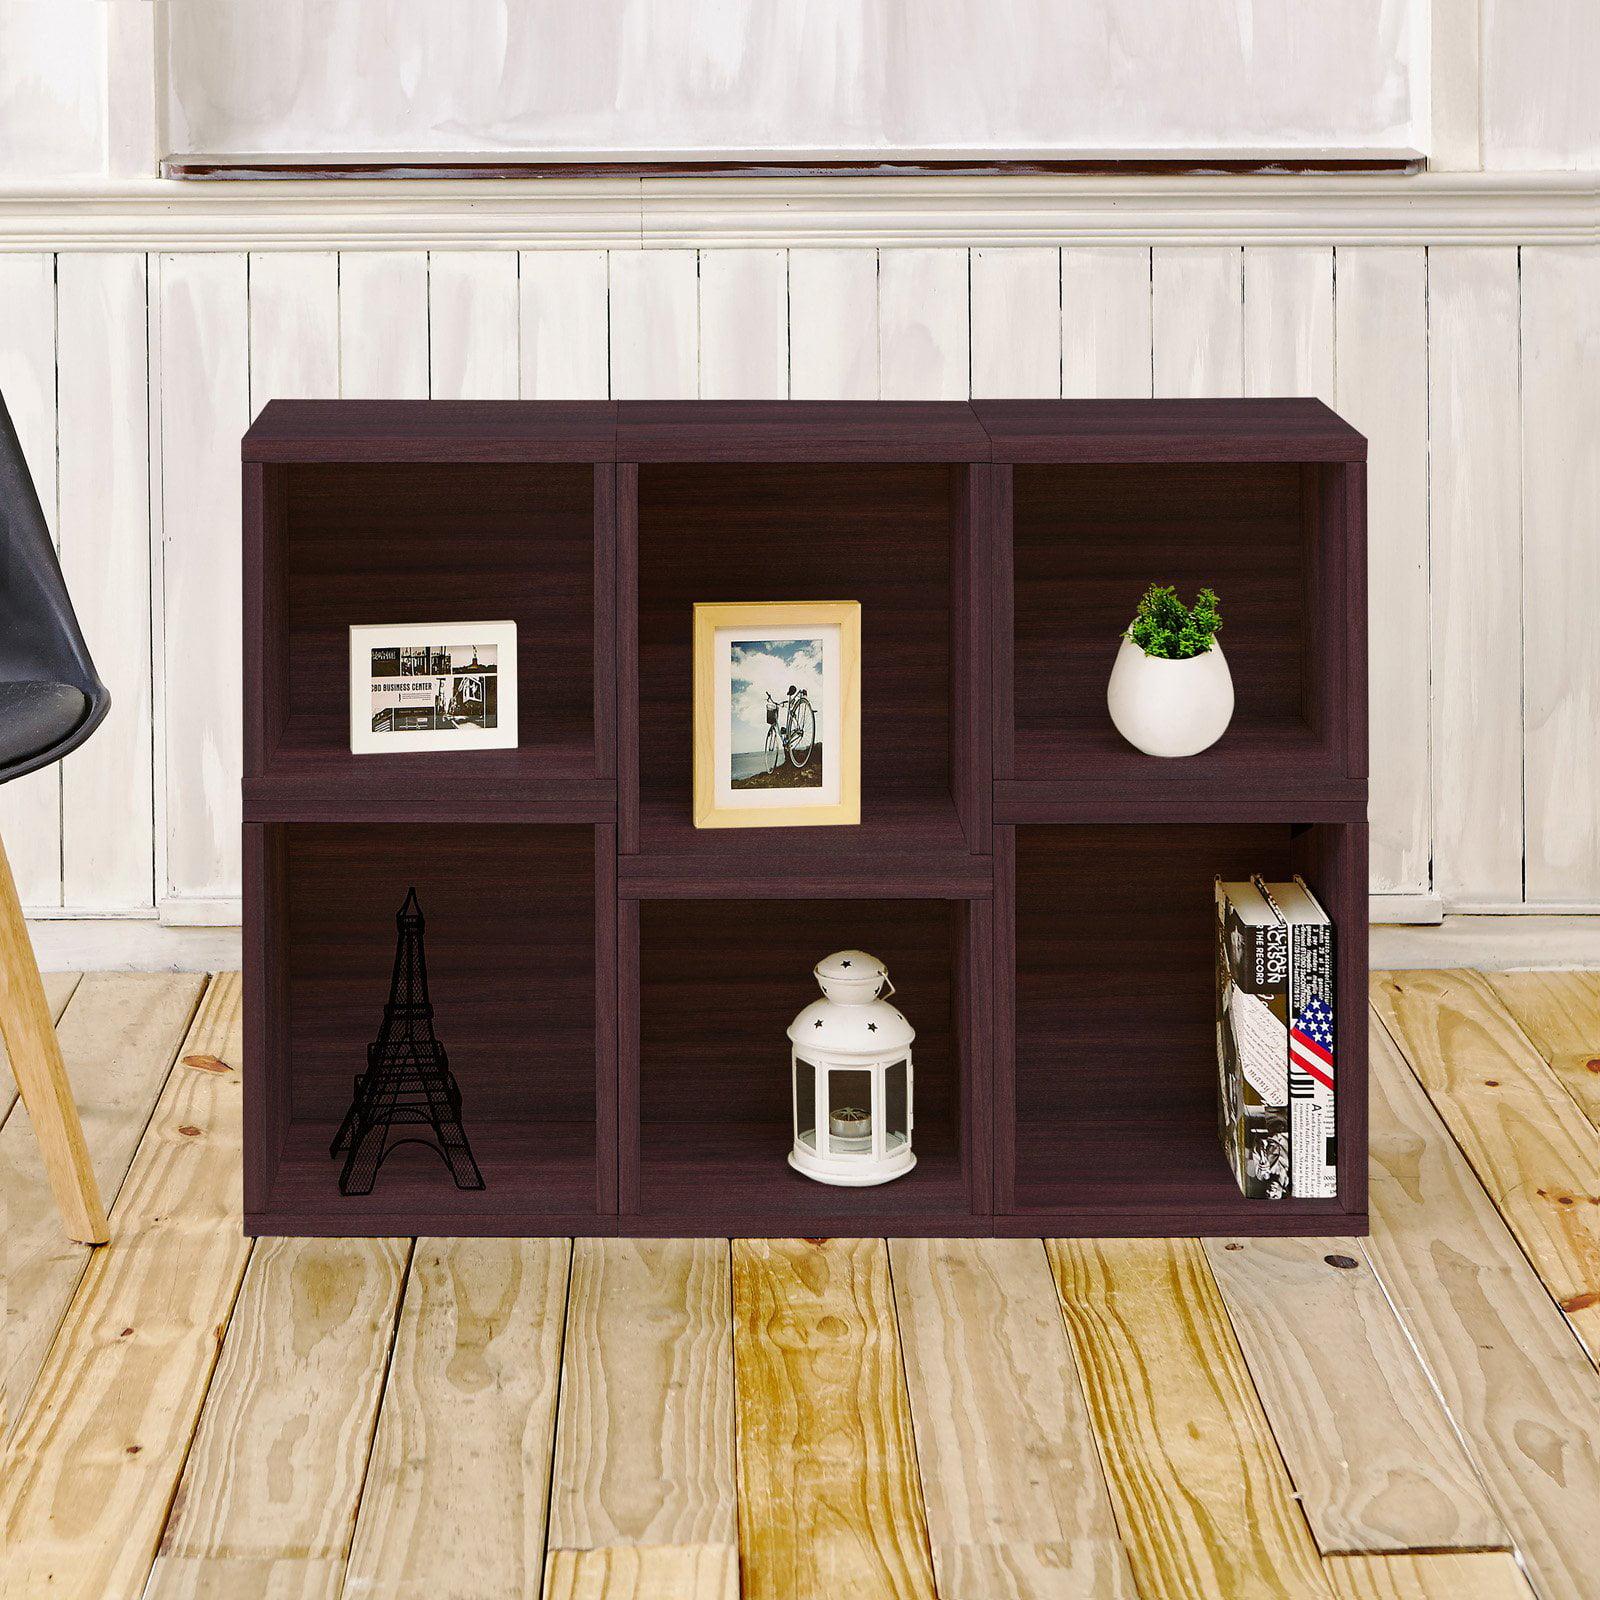 Way Basics Eco Stackable Arlington Modular Bookcase and Storage Shelf, Multiple Colors